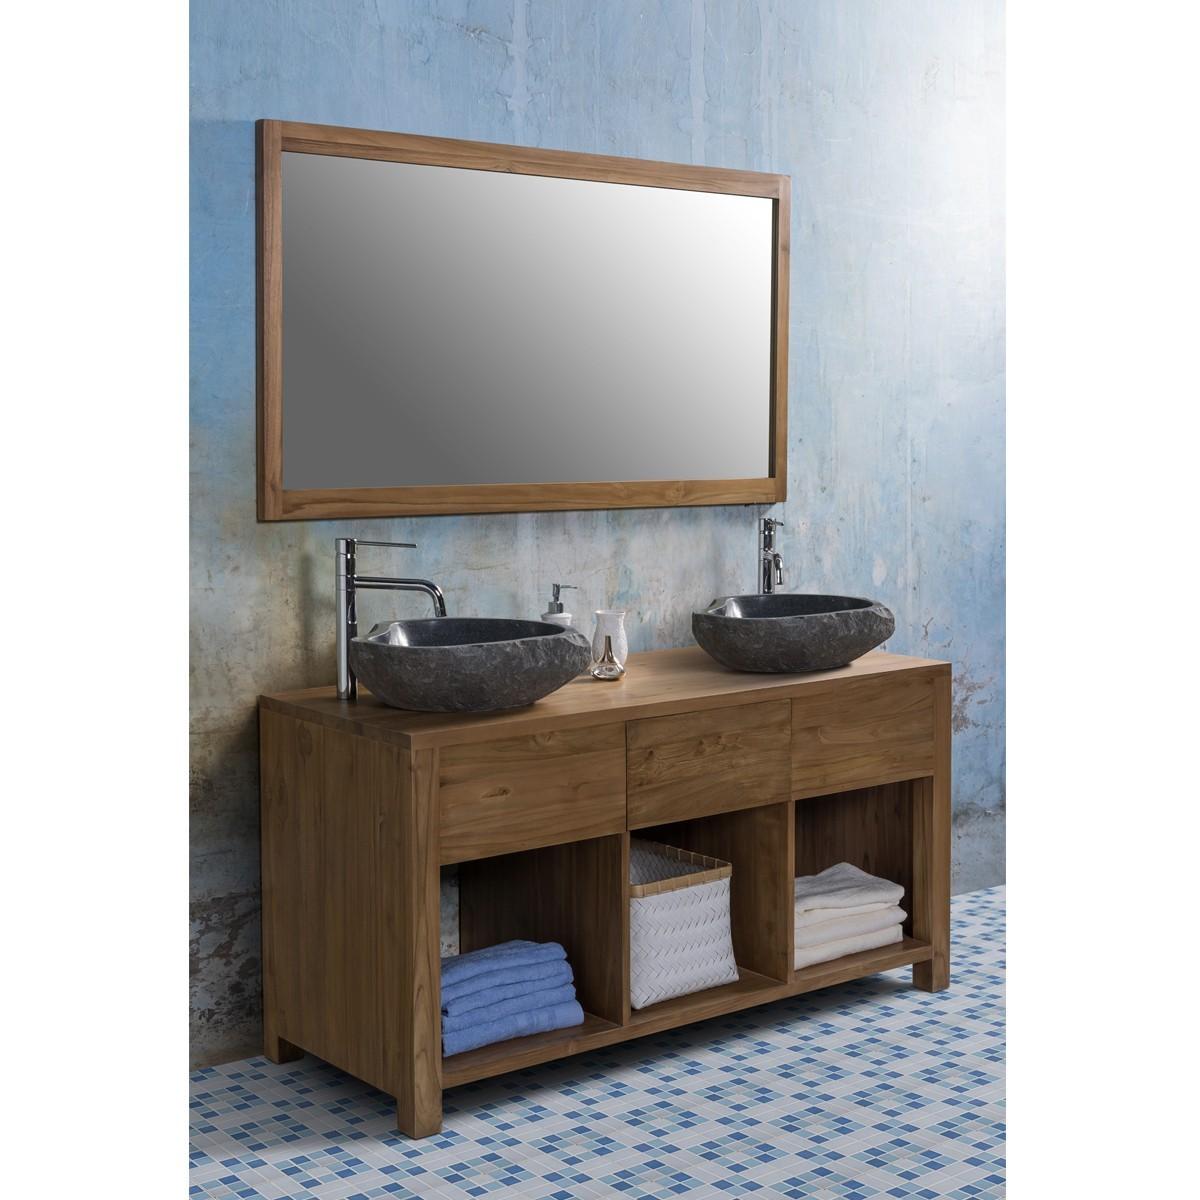 Ensemble de salle de bain en bois de teck 145 2 vasques for Salle de bain bois teck